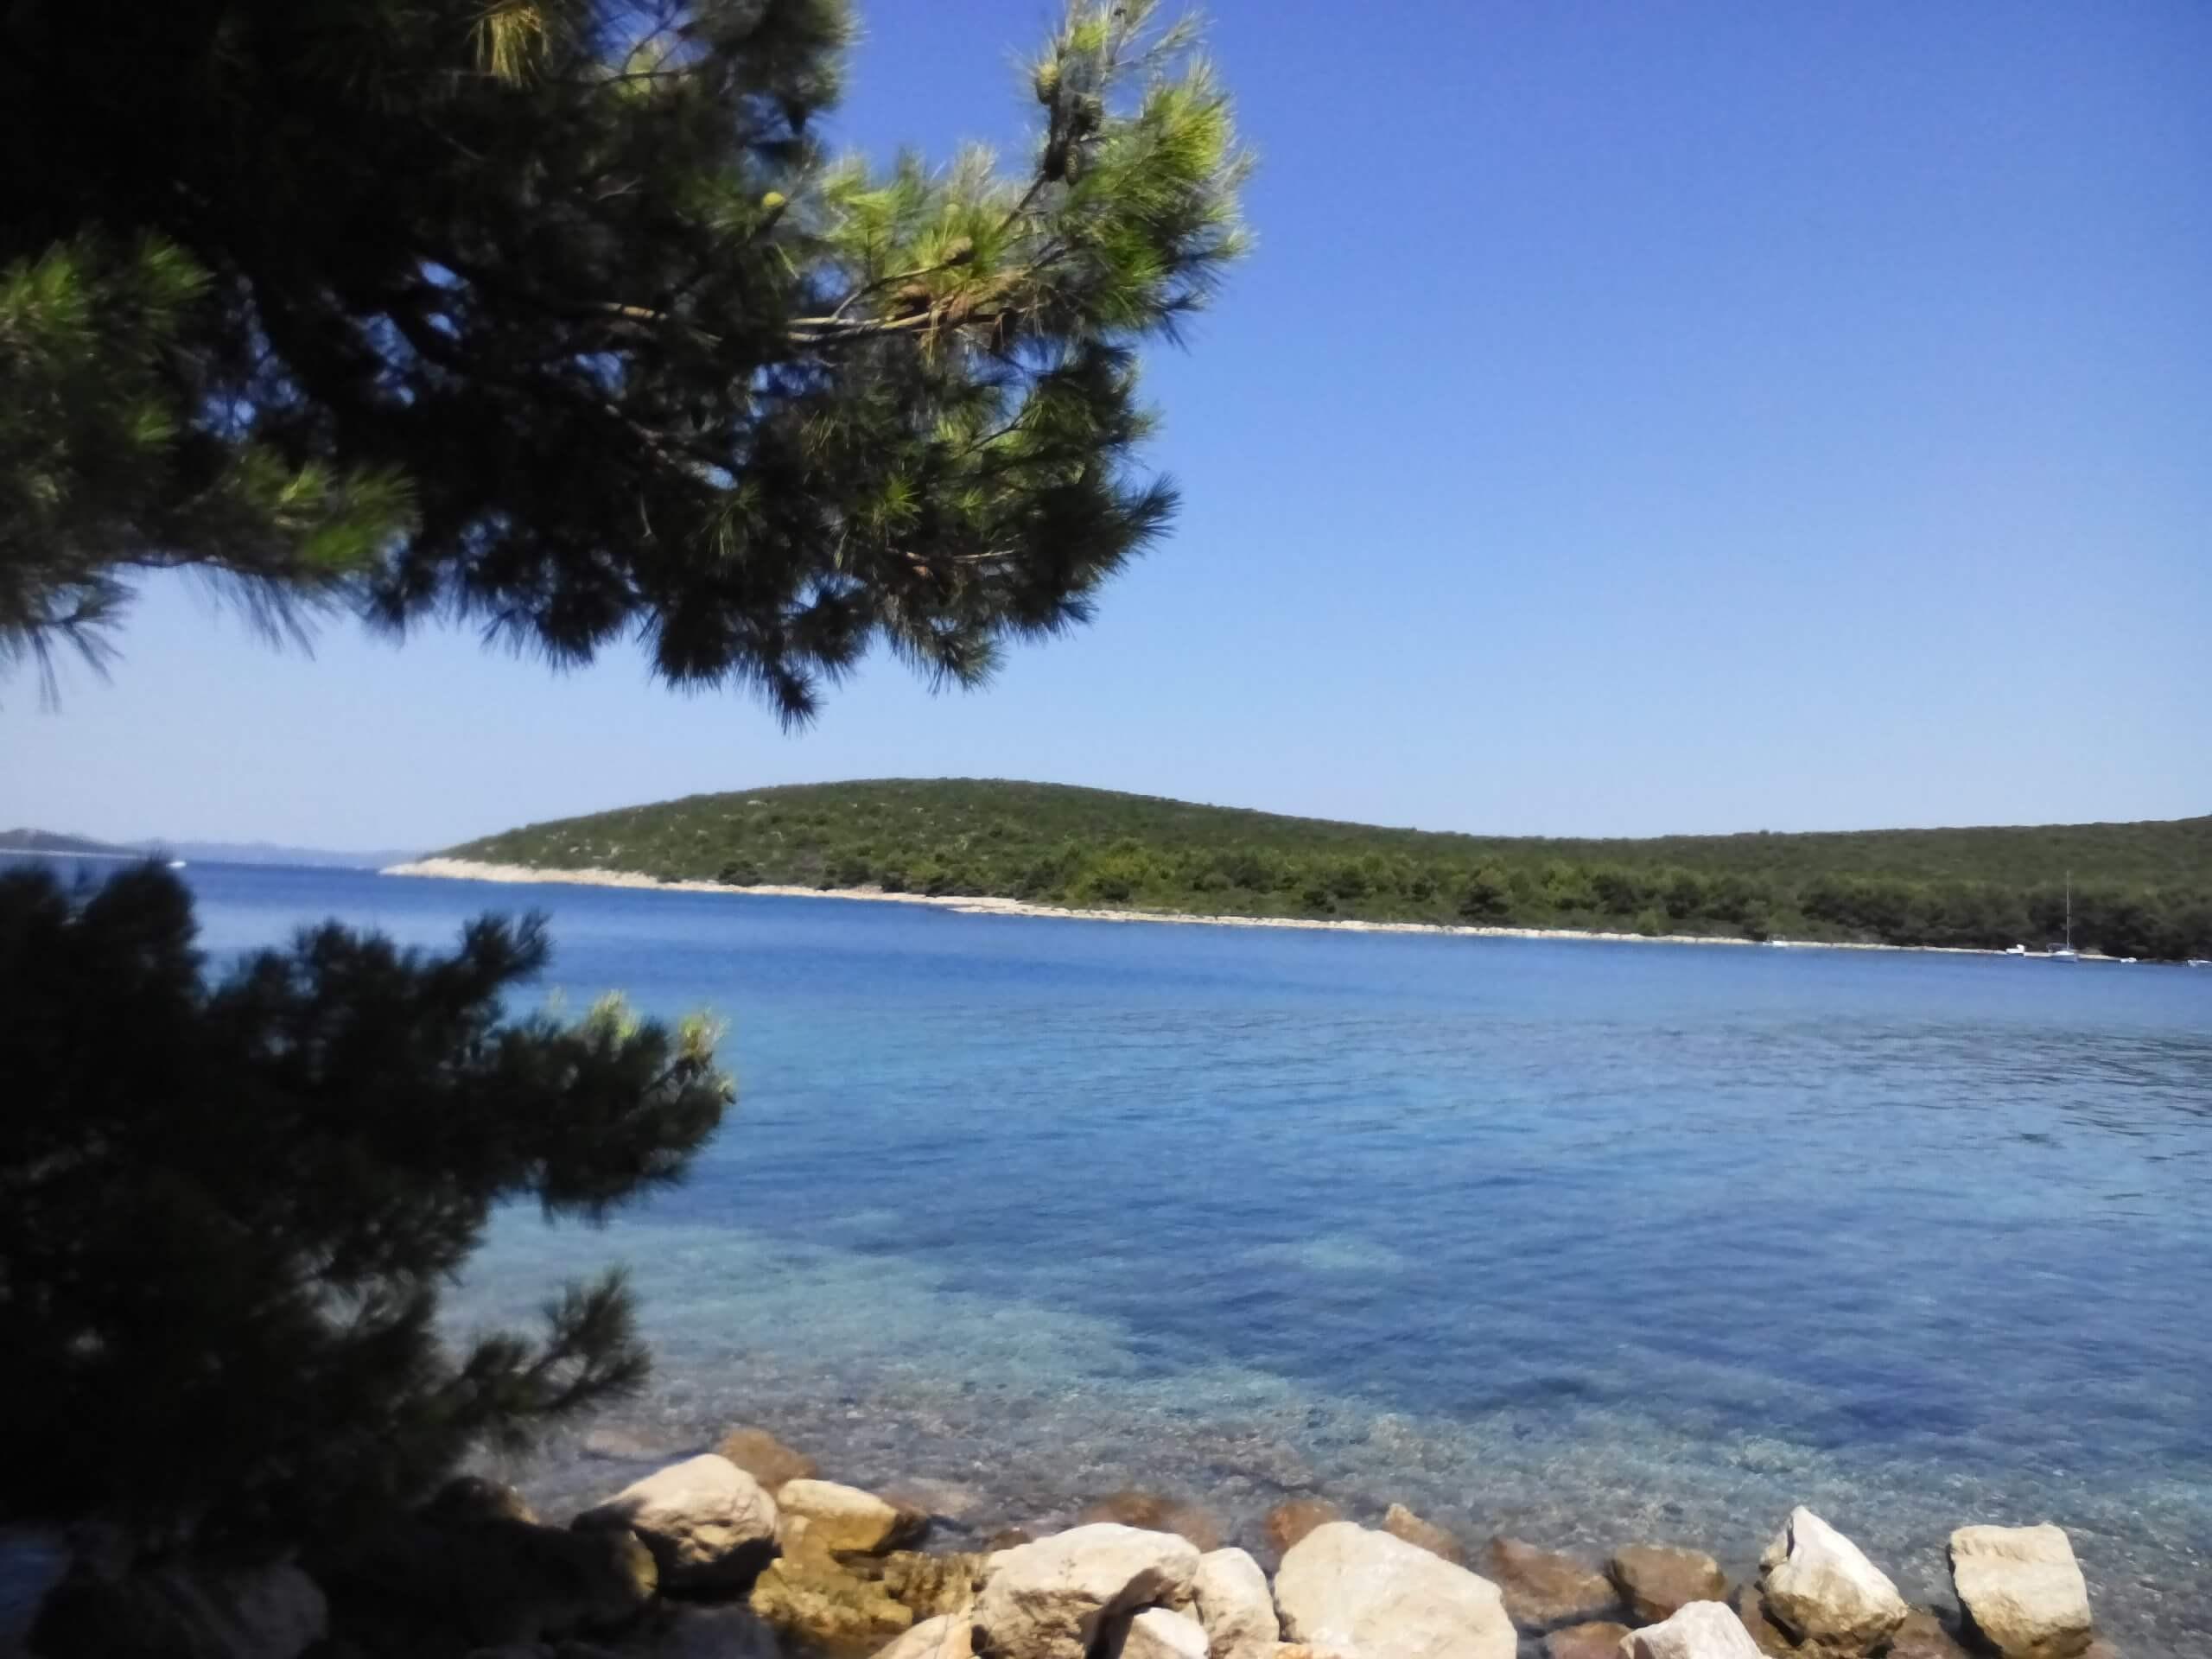 robinson-house-idro-island-pasman-croatia